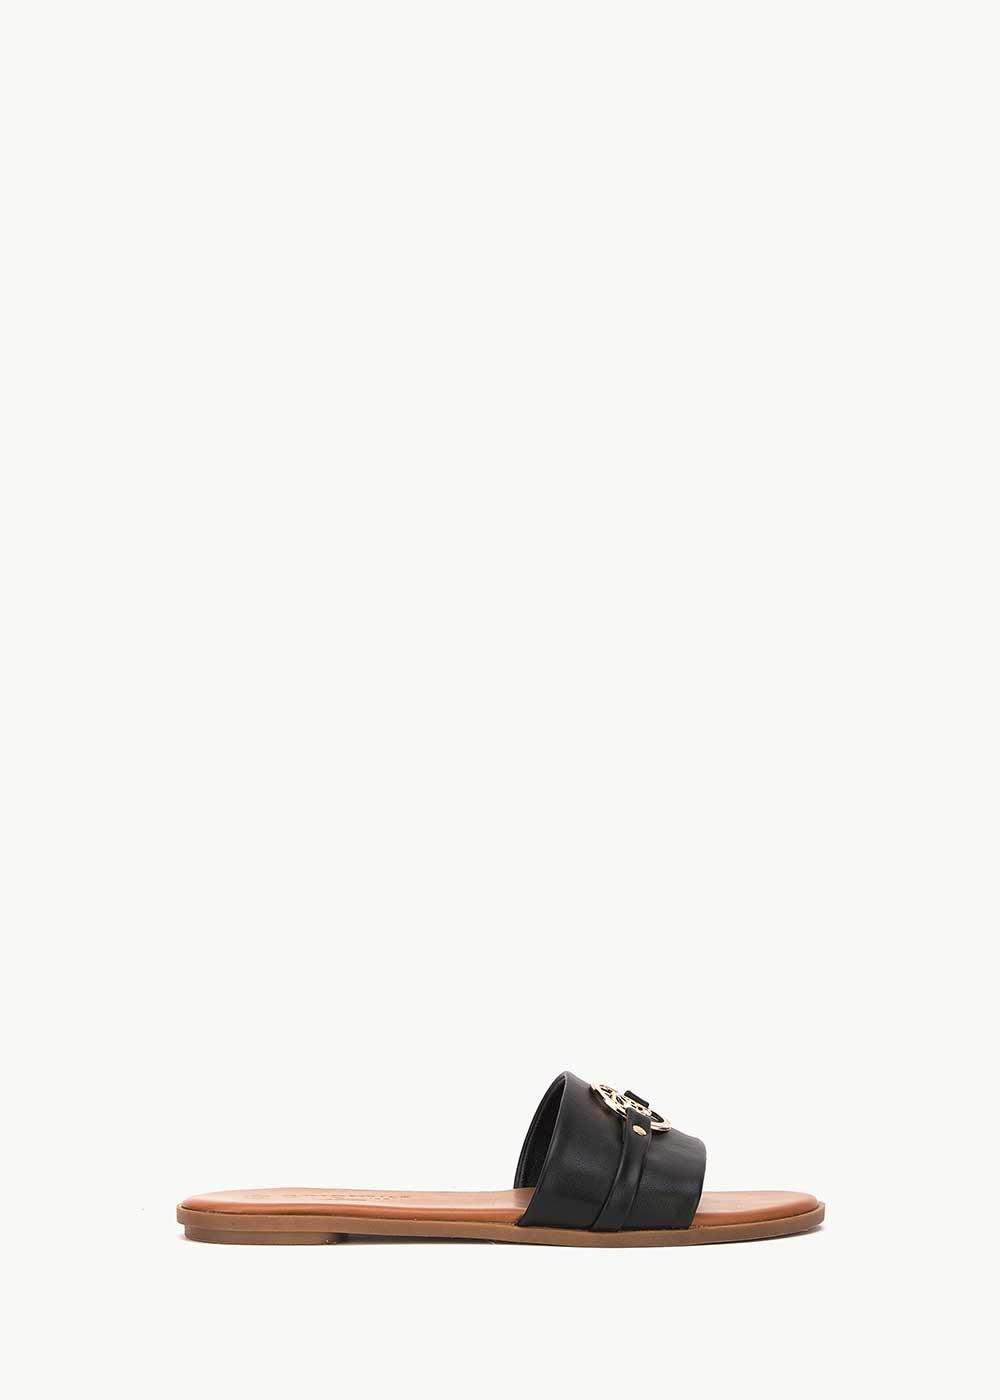 Sydne sandal with CI logo - Black - Woman